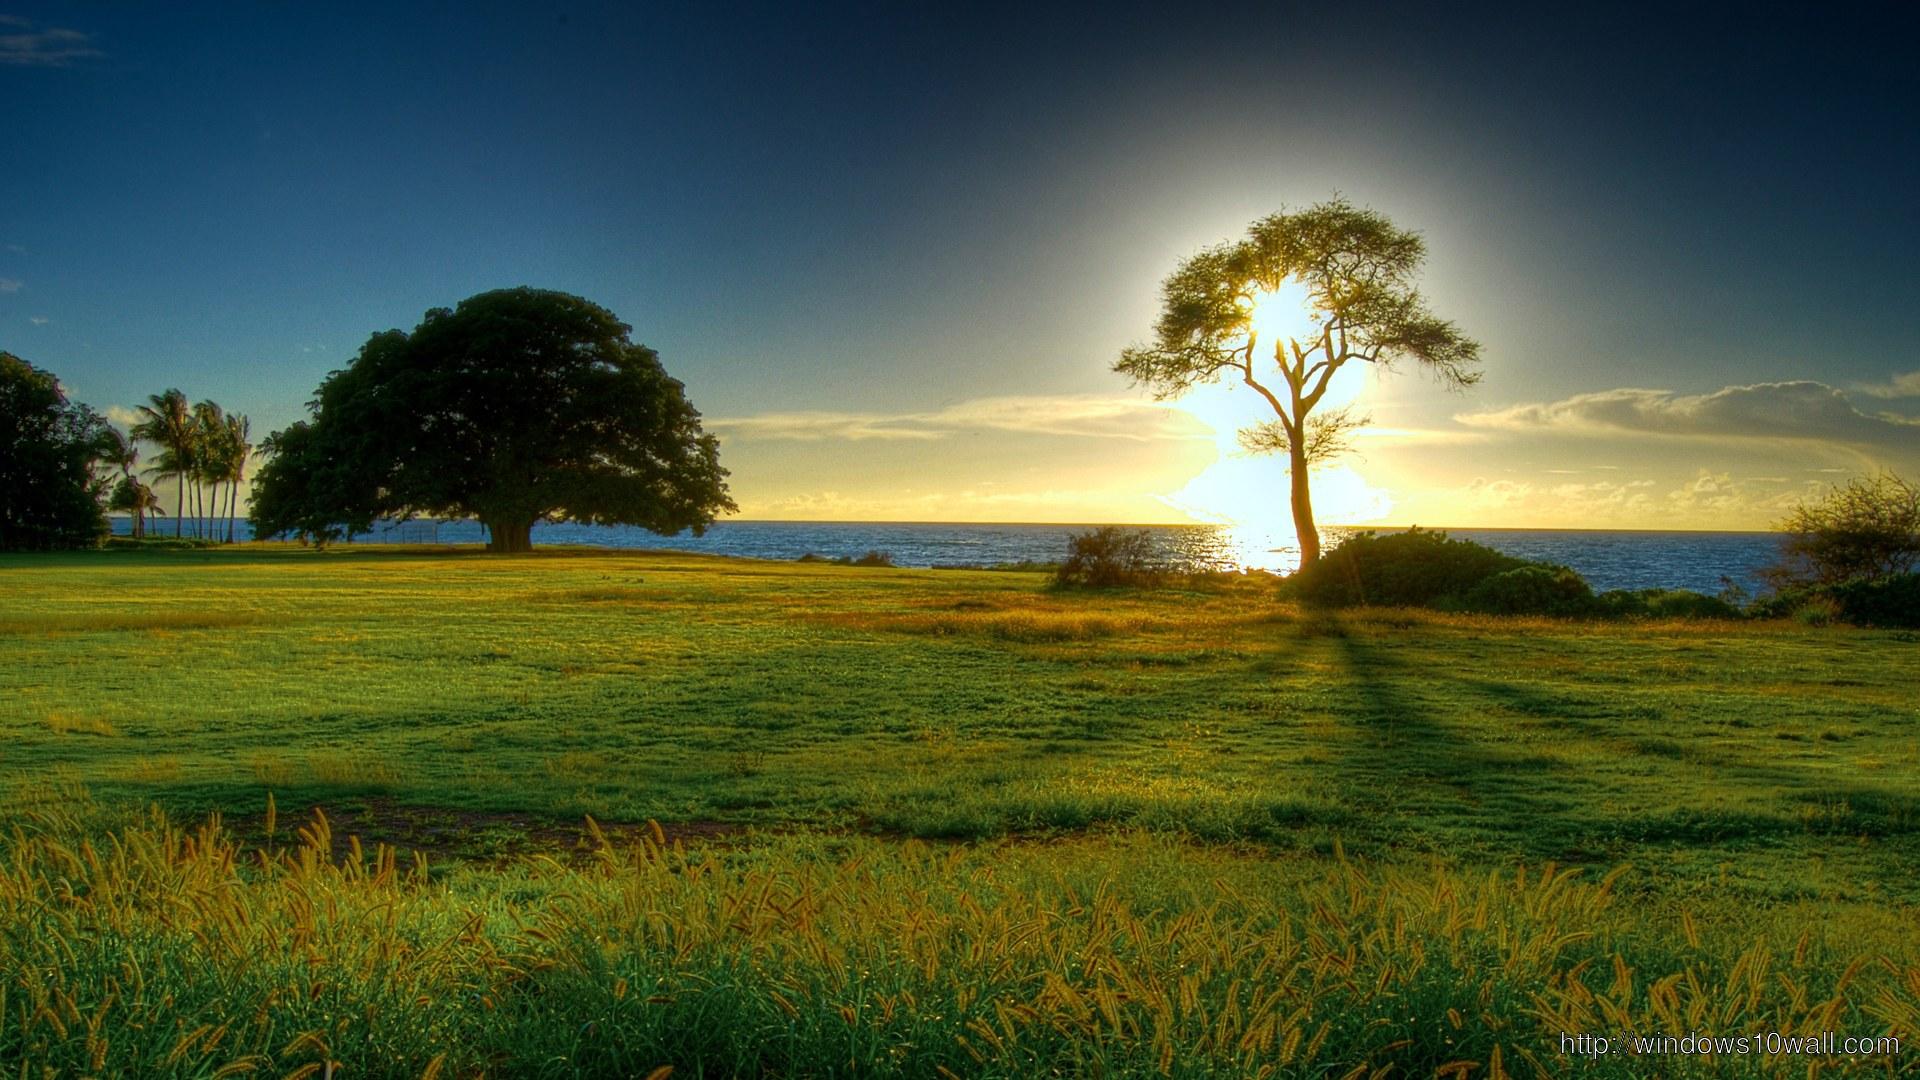 beautiful nature hd wallpaper free download - windows 10 wallpapers